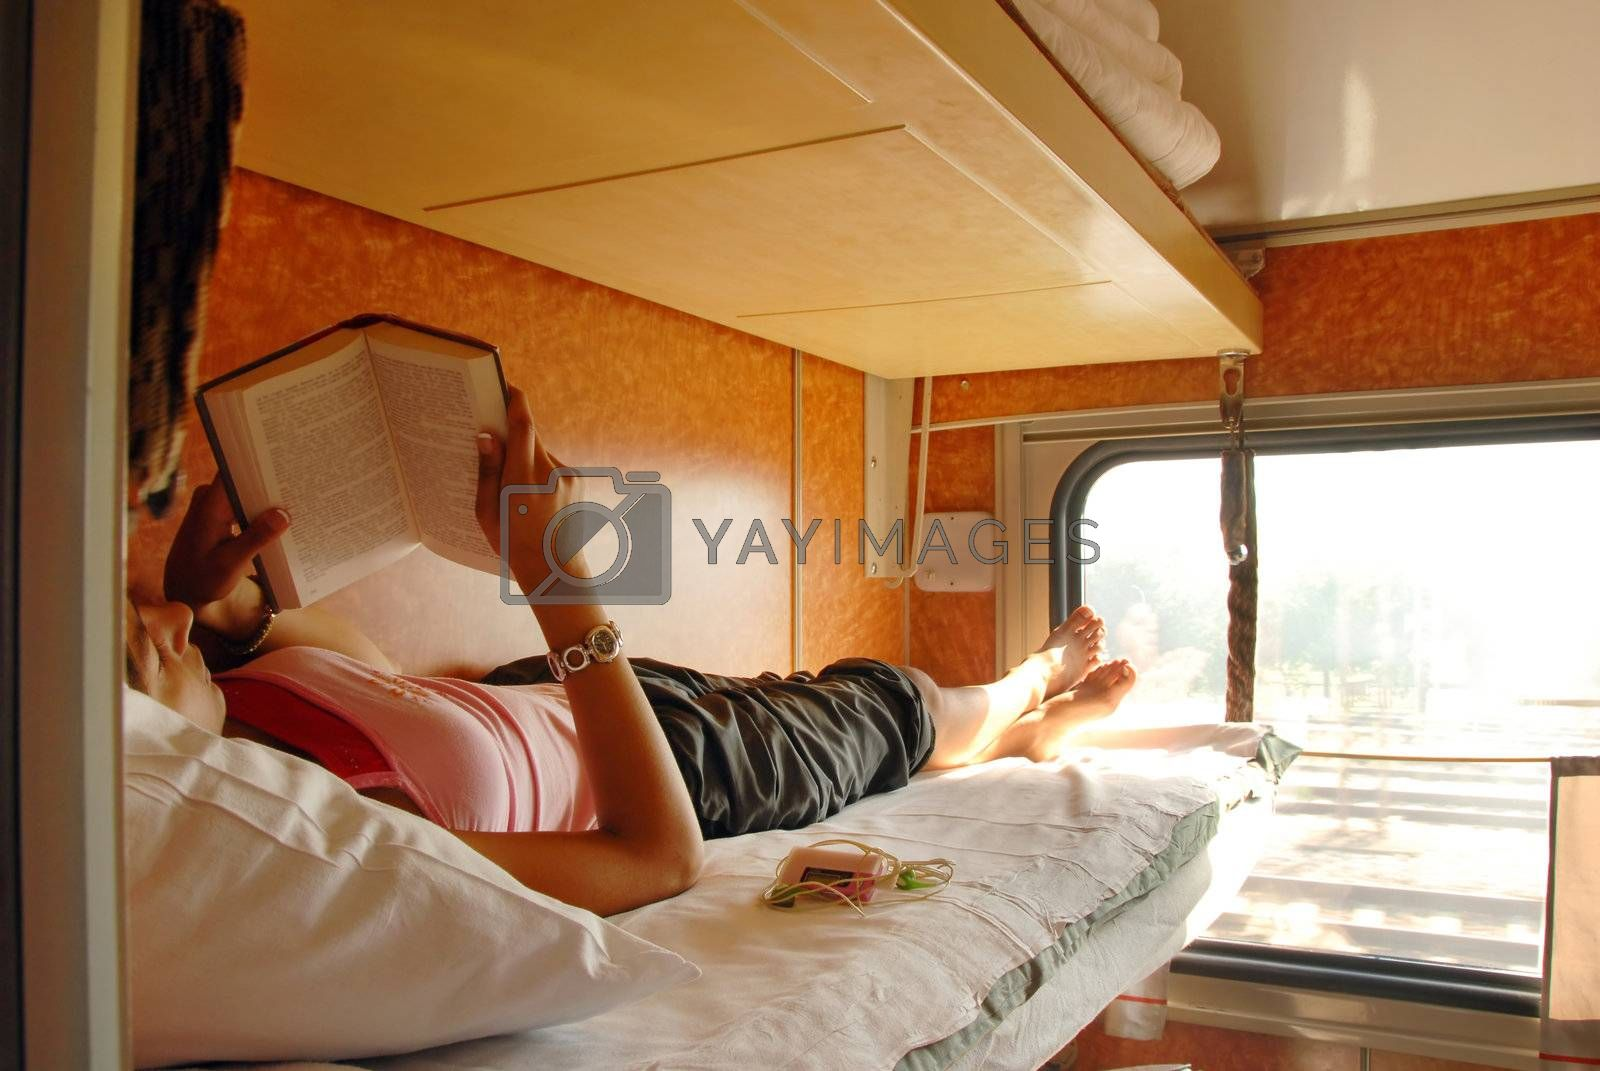 girl lying and reeding a book in sleeping wagon in train